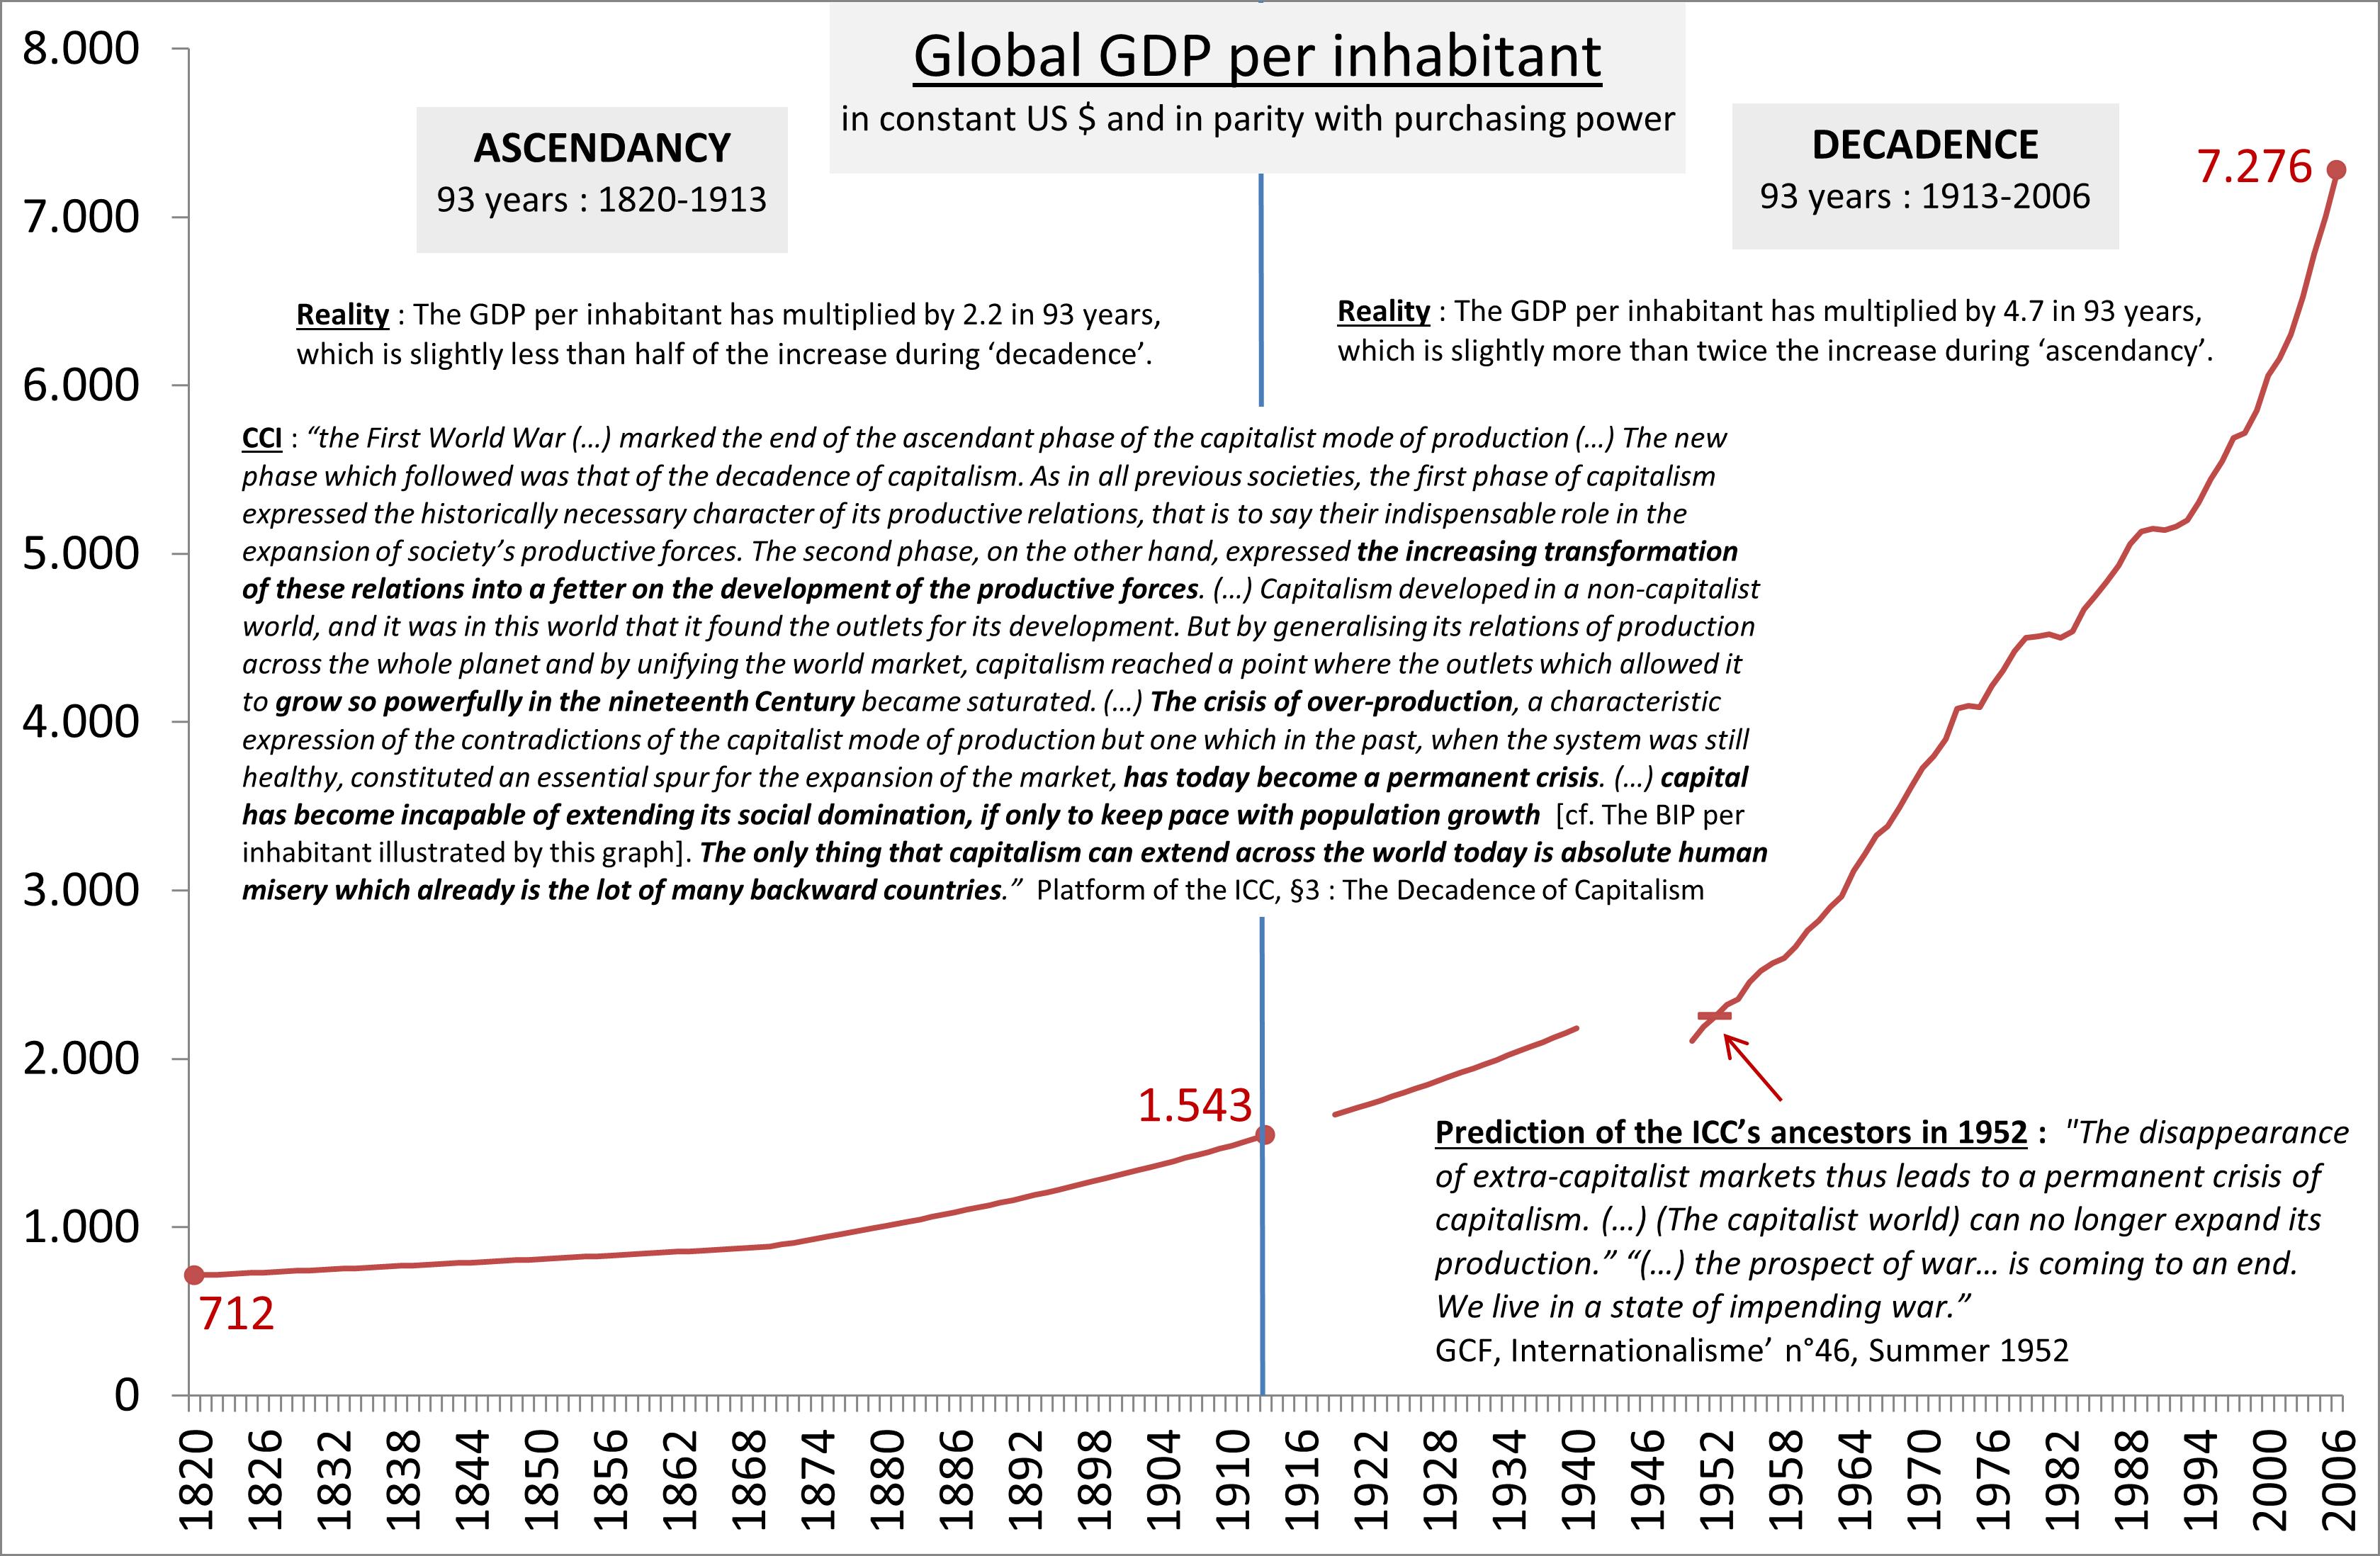 Graph 1.2 - Global GDP per inhabitant (1820-2006)